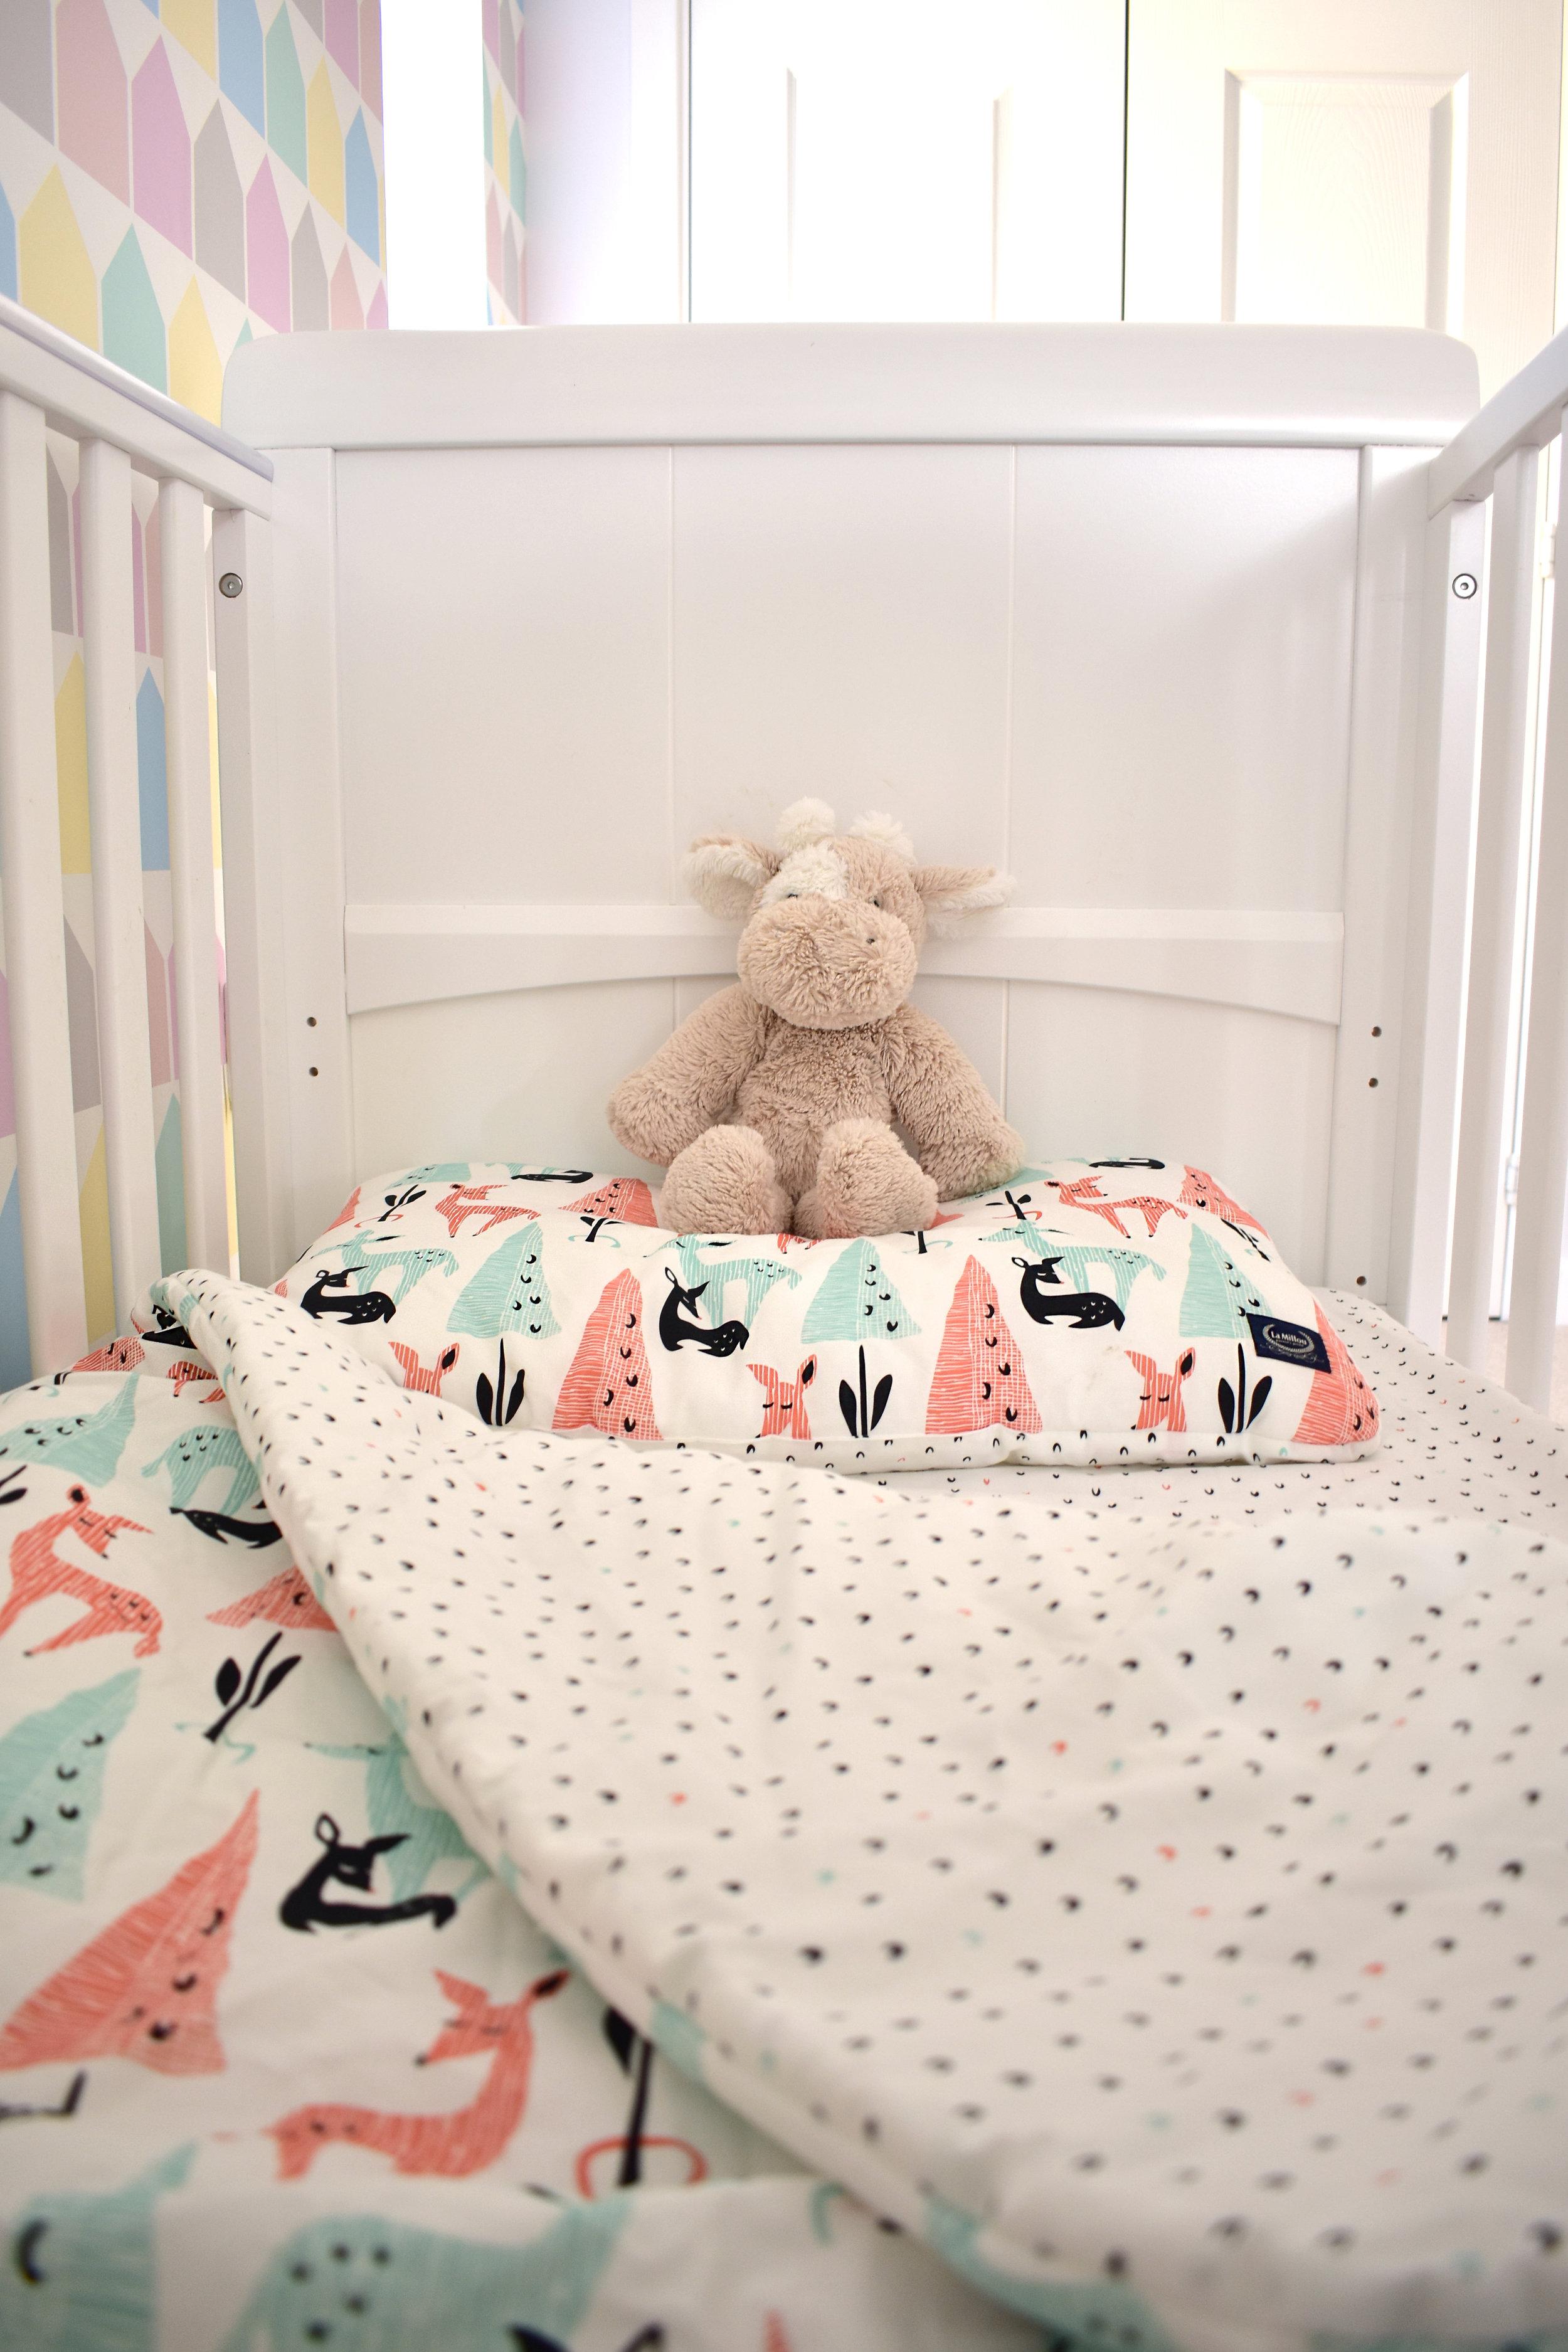 bdandmax bedding